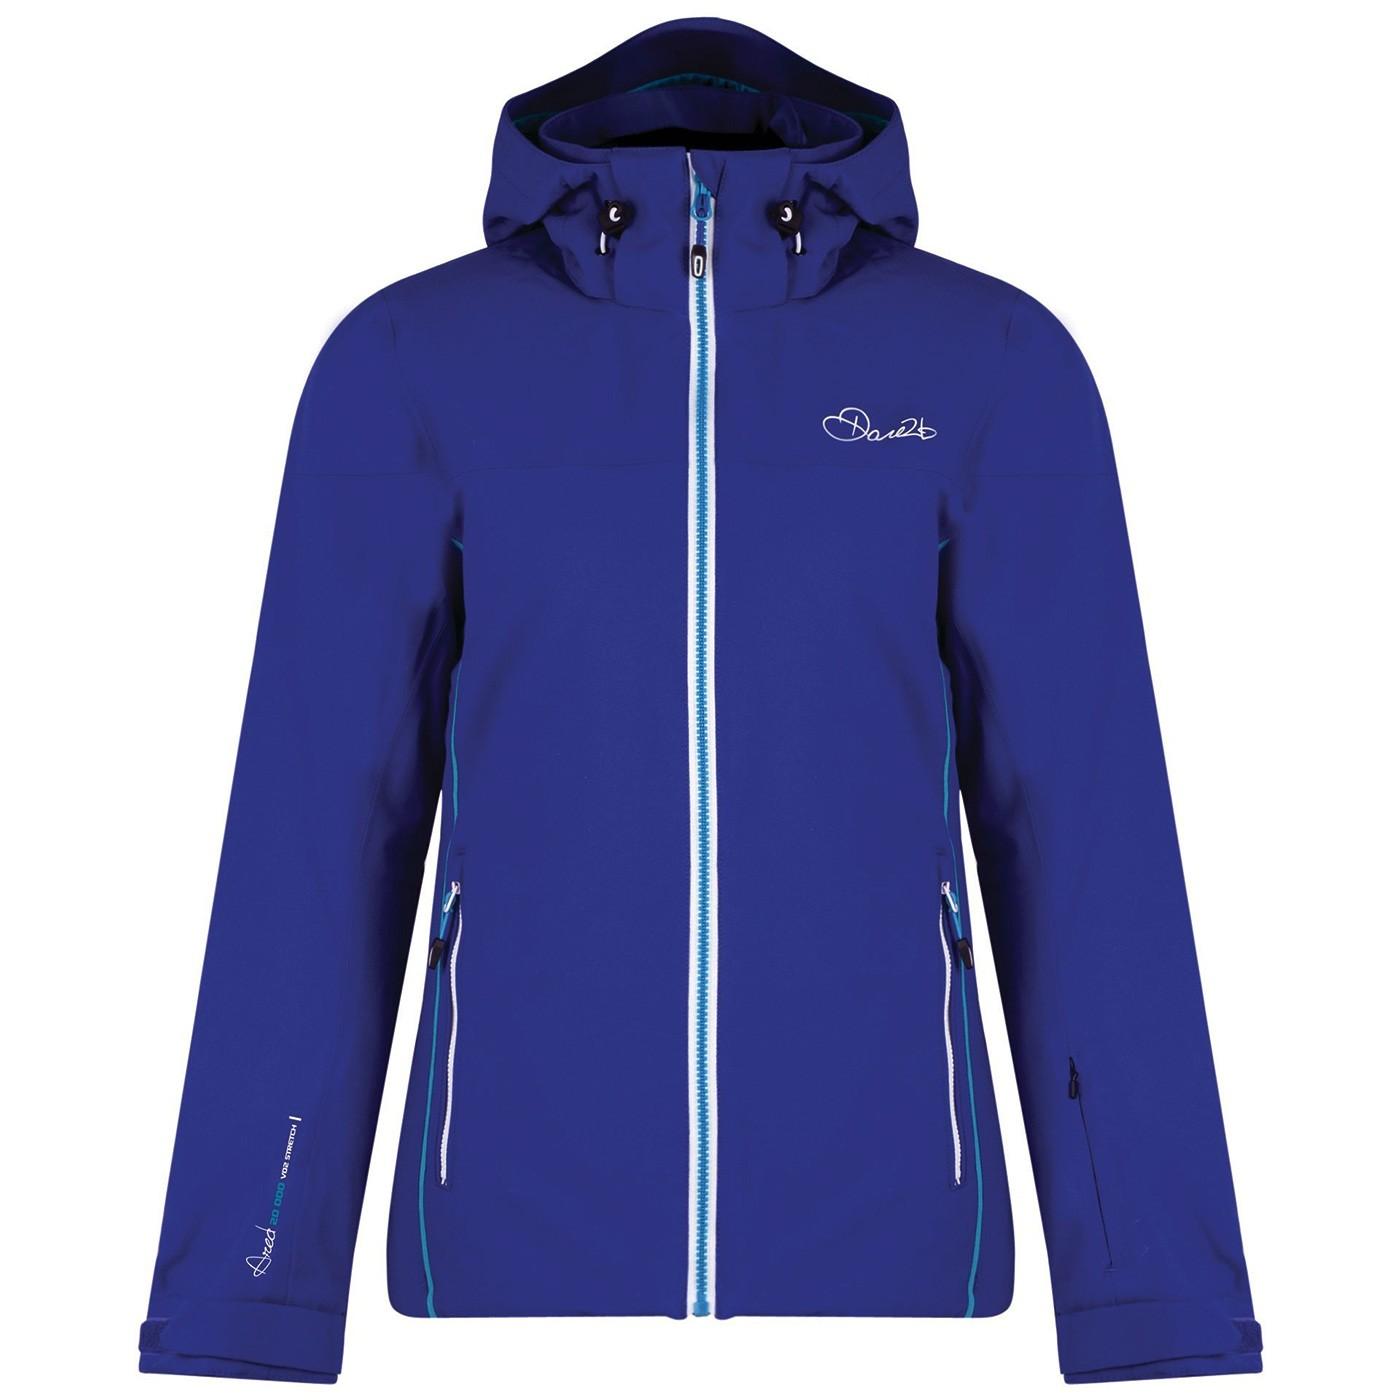 0393600828 Ski jacket Dare 2b Invoke II Woman - Ski clothing